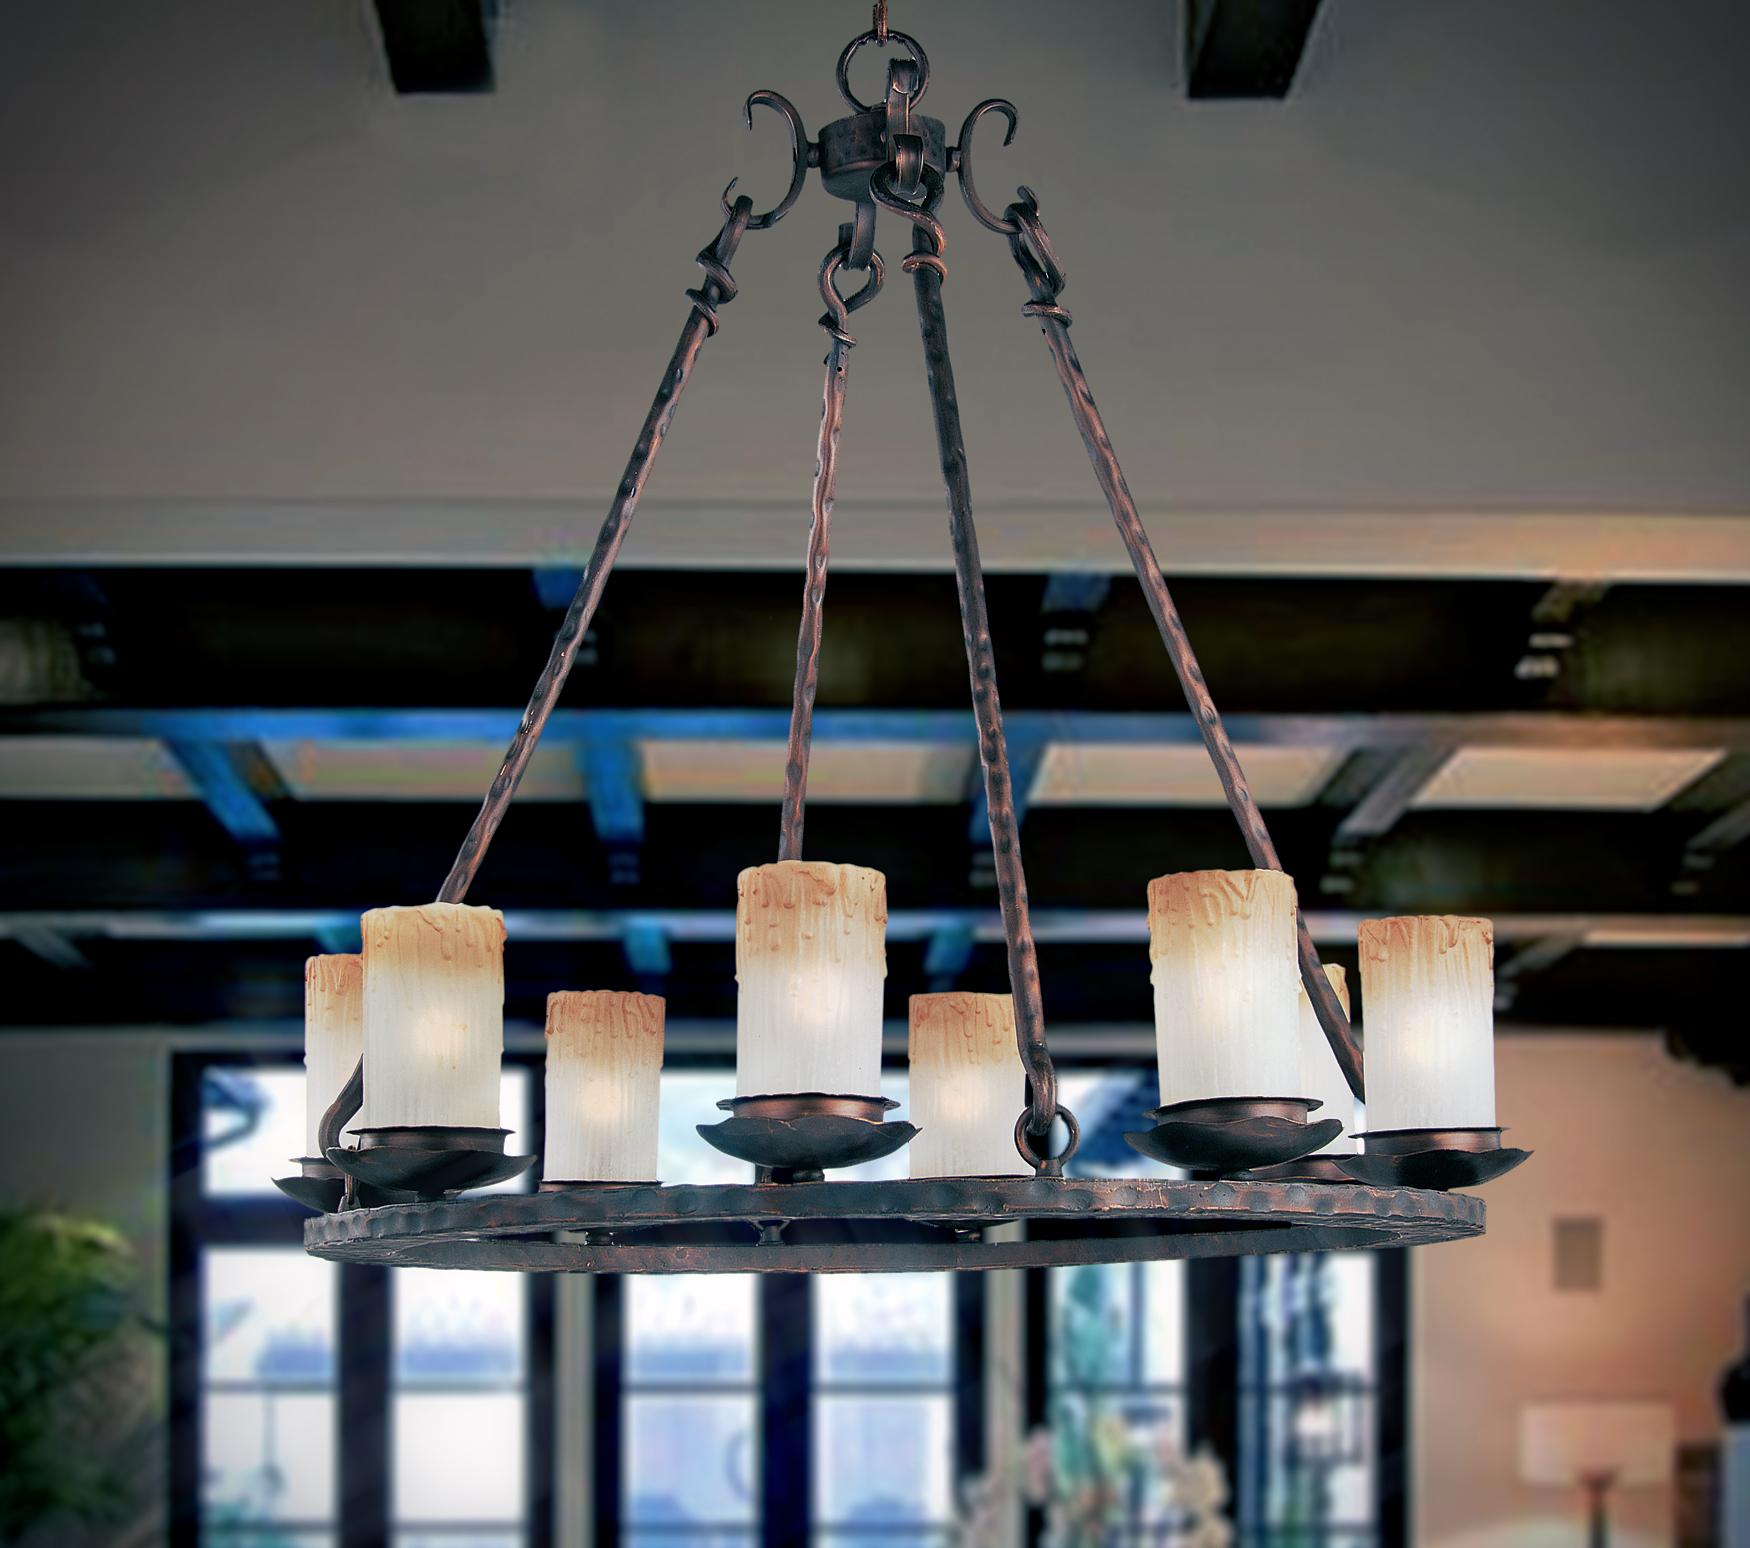 Notre dame 8 light chandelier single tier chandelier maxim lighting notre dame 8 light chandelier arubaitofo Images